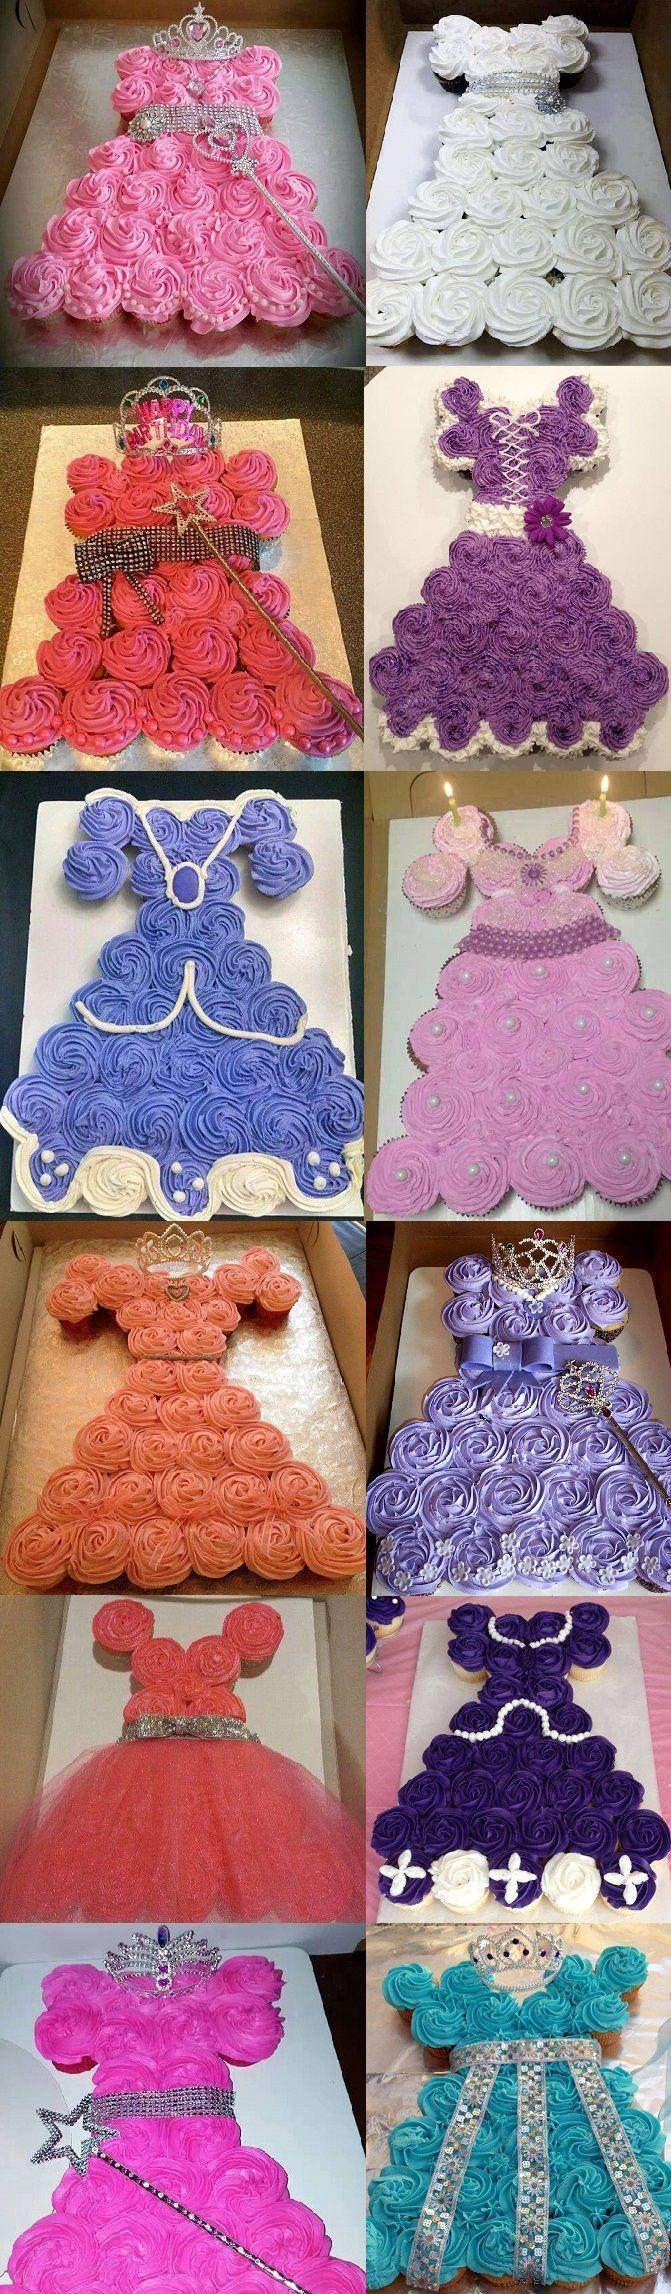 Princess Dresses Cupcakes